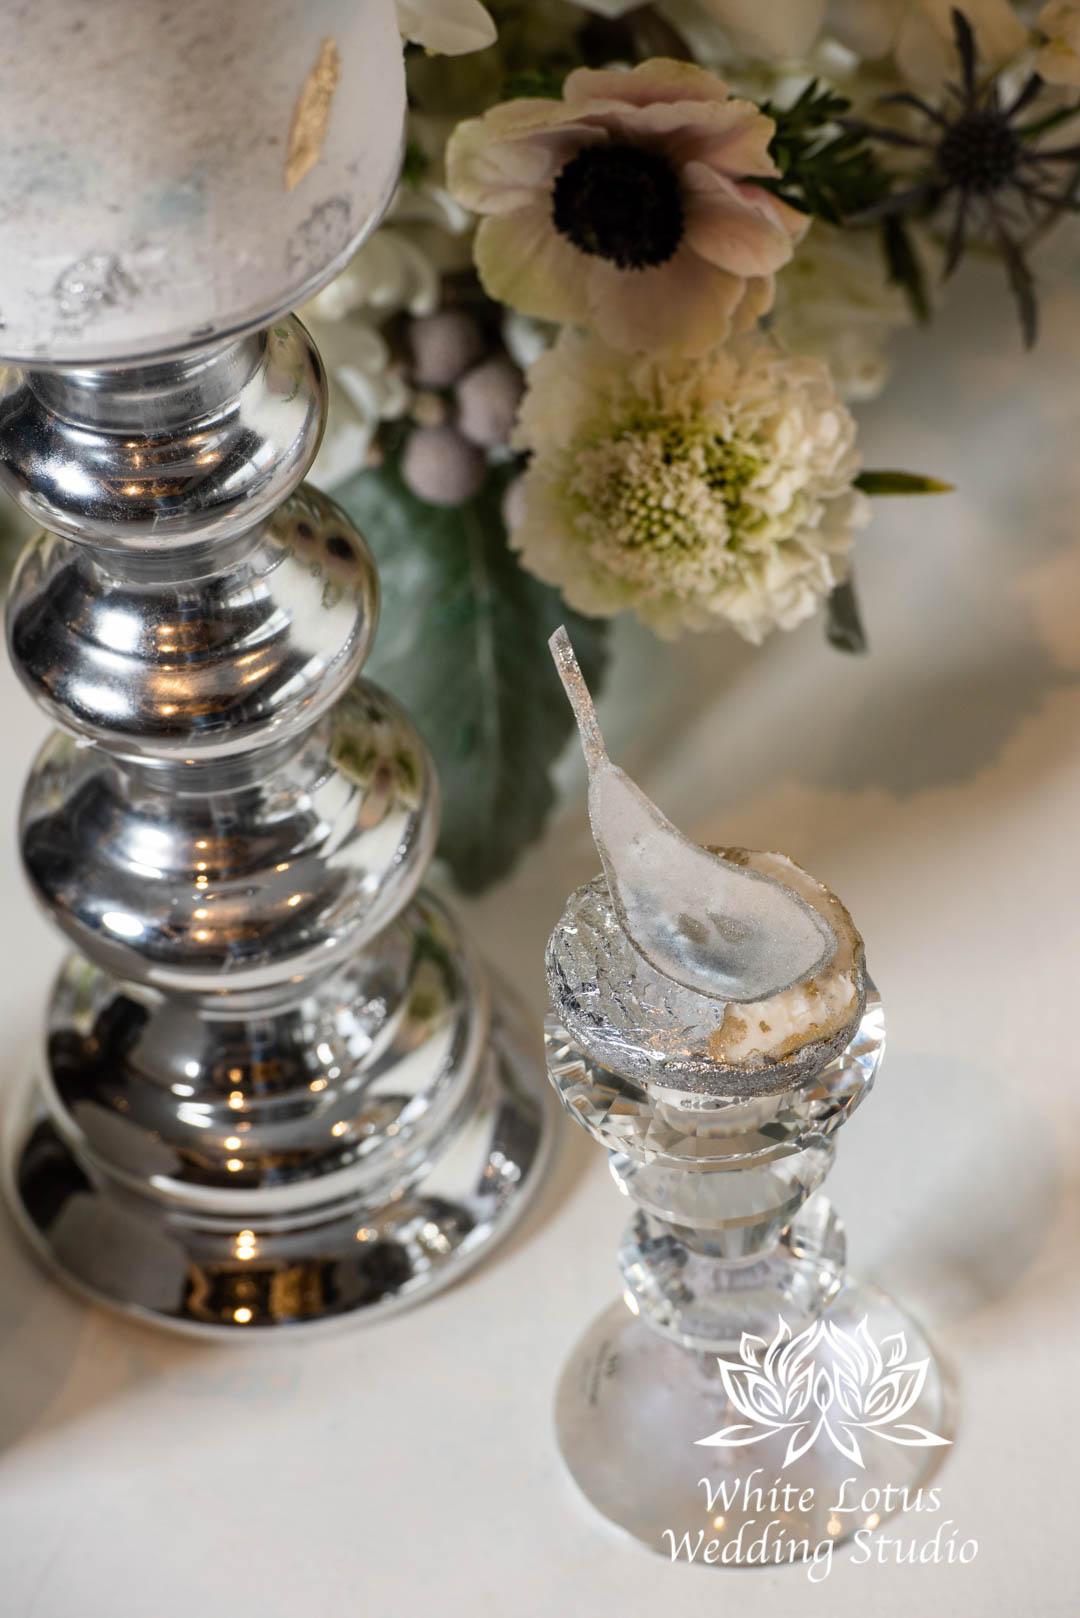 093- GLAM WINTERLUXE WEDDING INSPIRATION